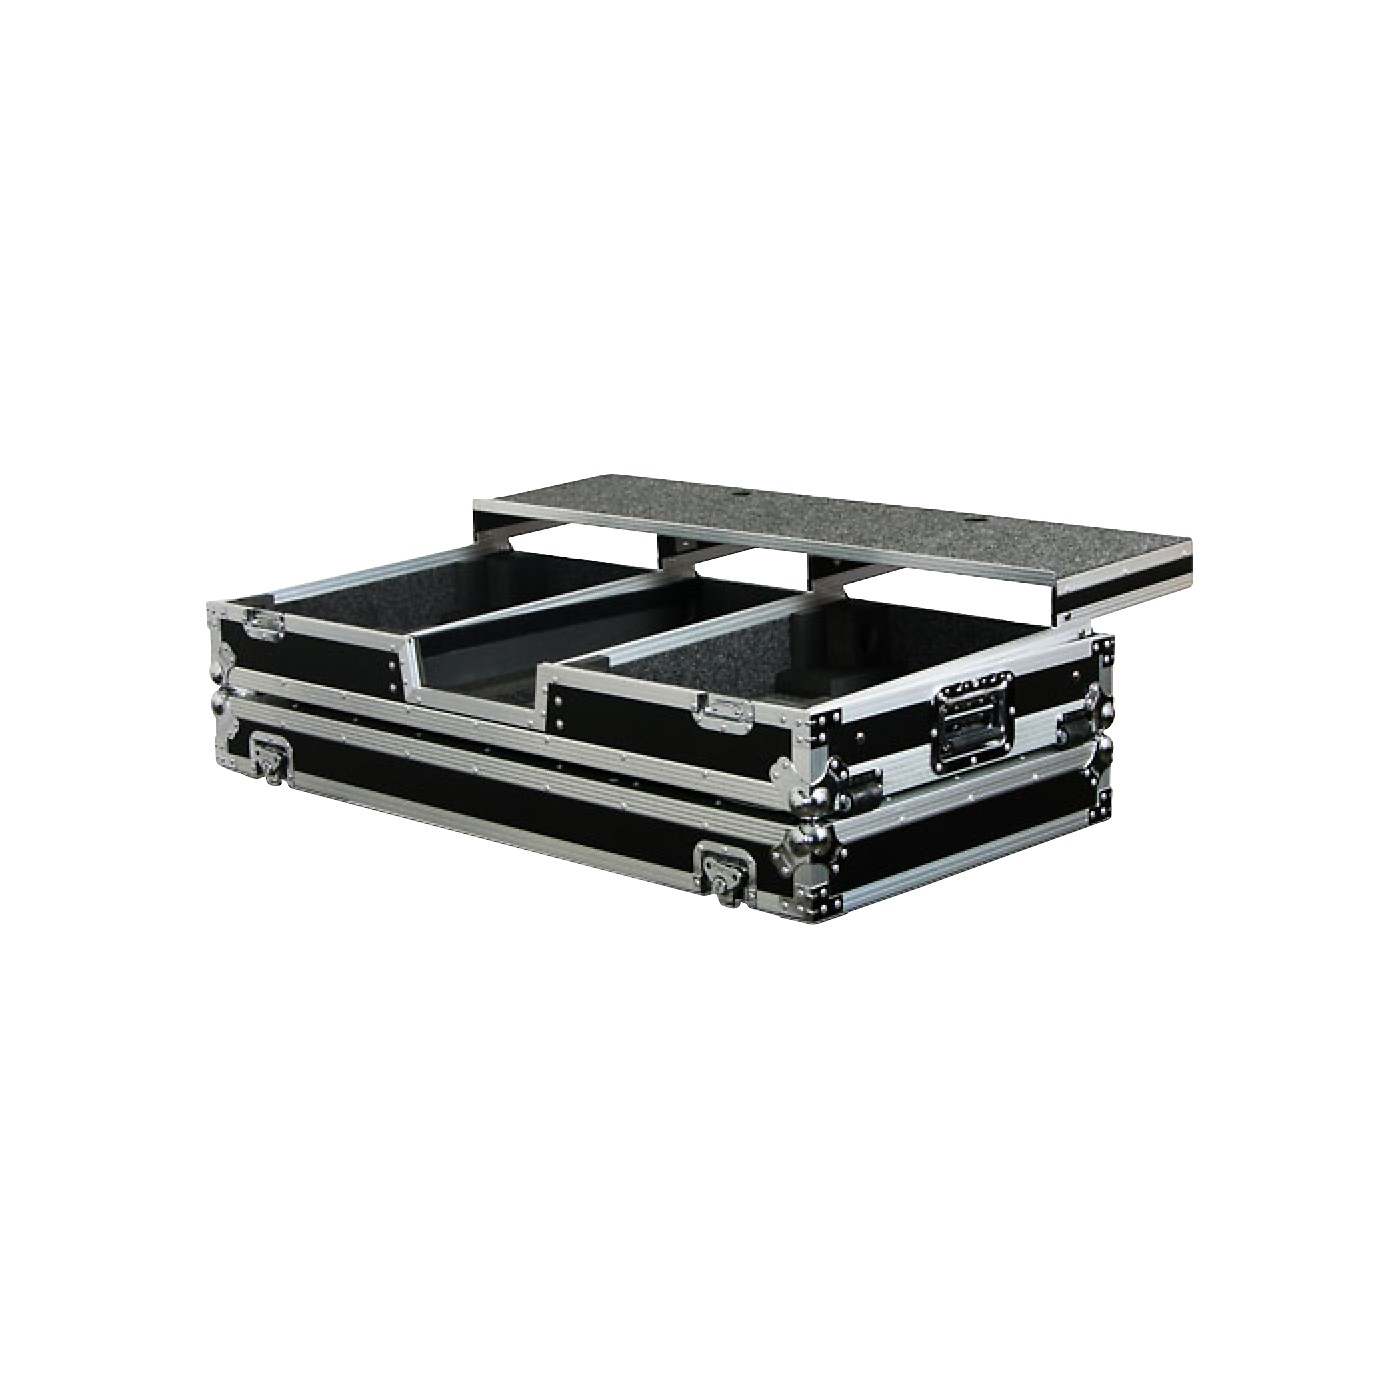 Odyssey FZGSPBM10W Remixer Turntable DJ Coffin Case 10